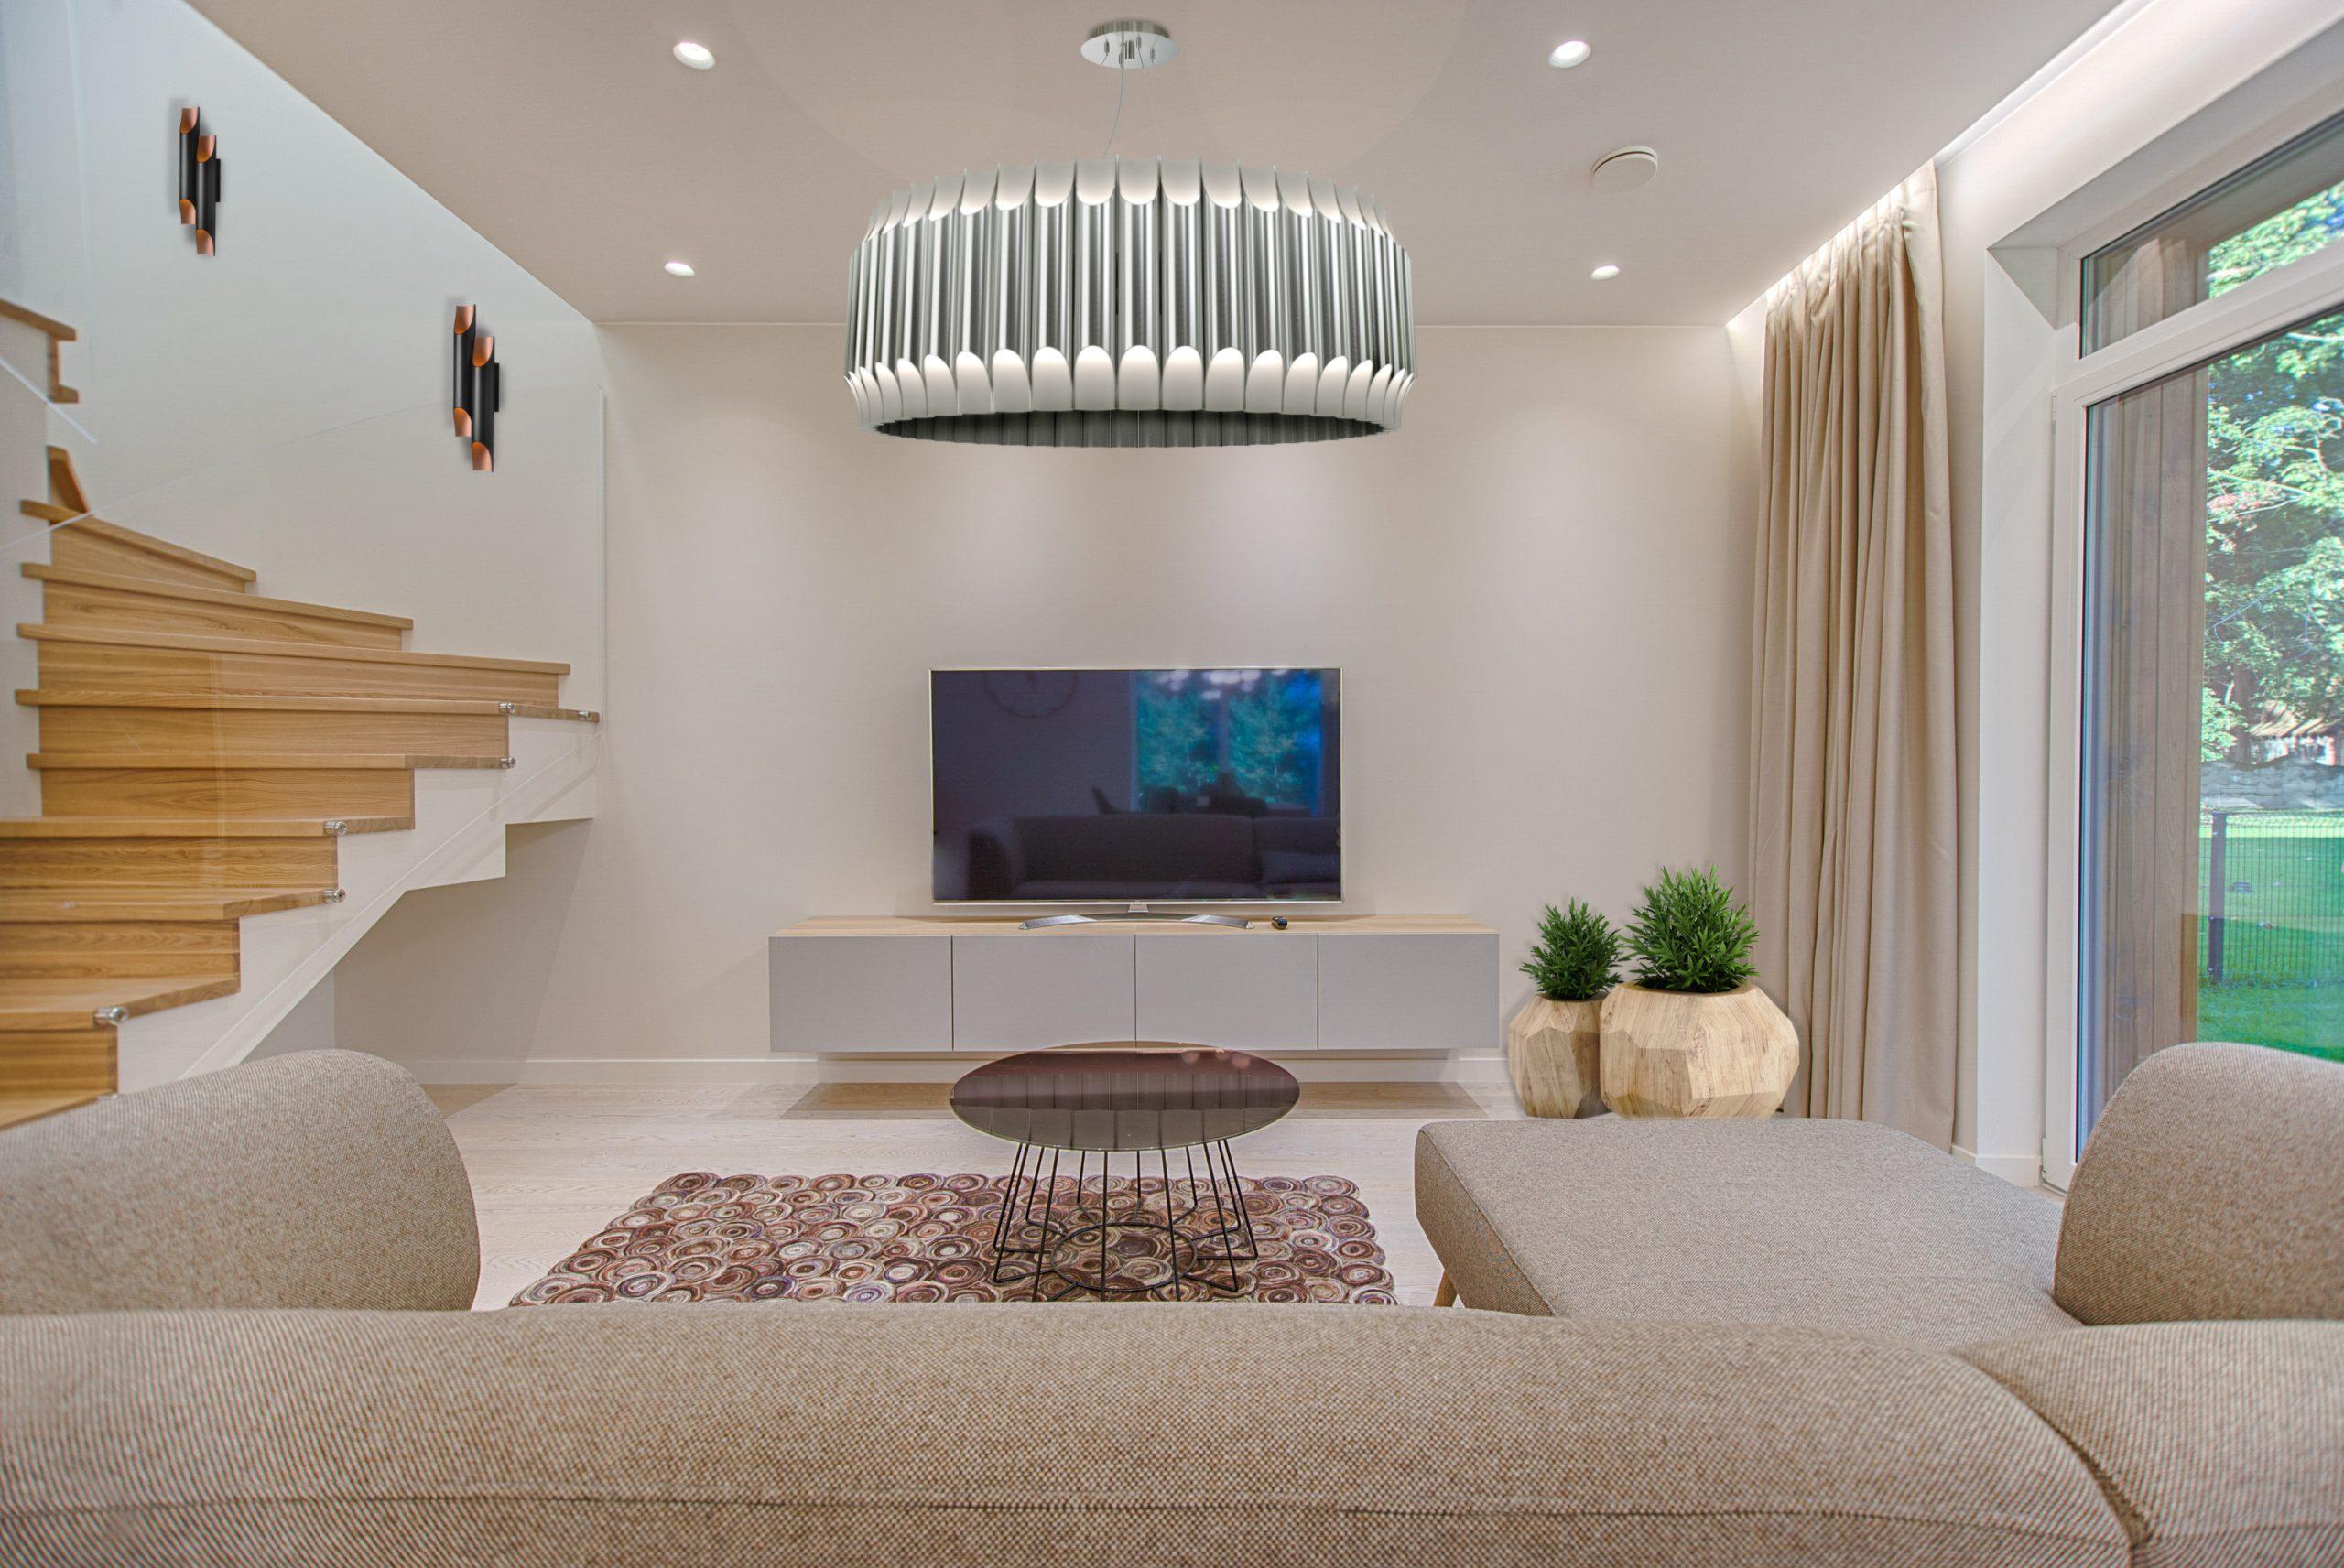 Best Deals: The Perfect TV Room Decor Lighting tv room lighting decor Best Deals: The Perfect TV Room Lighting Decor 📺 gallianos scaled